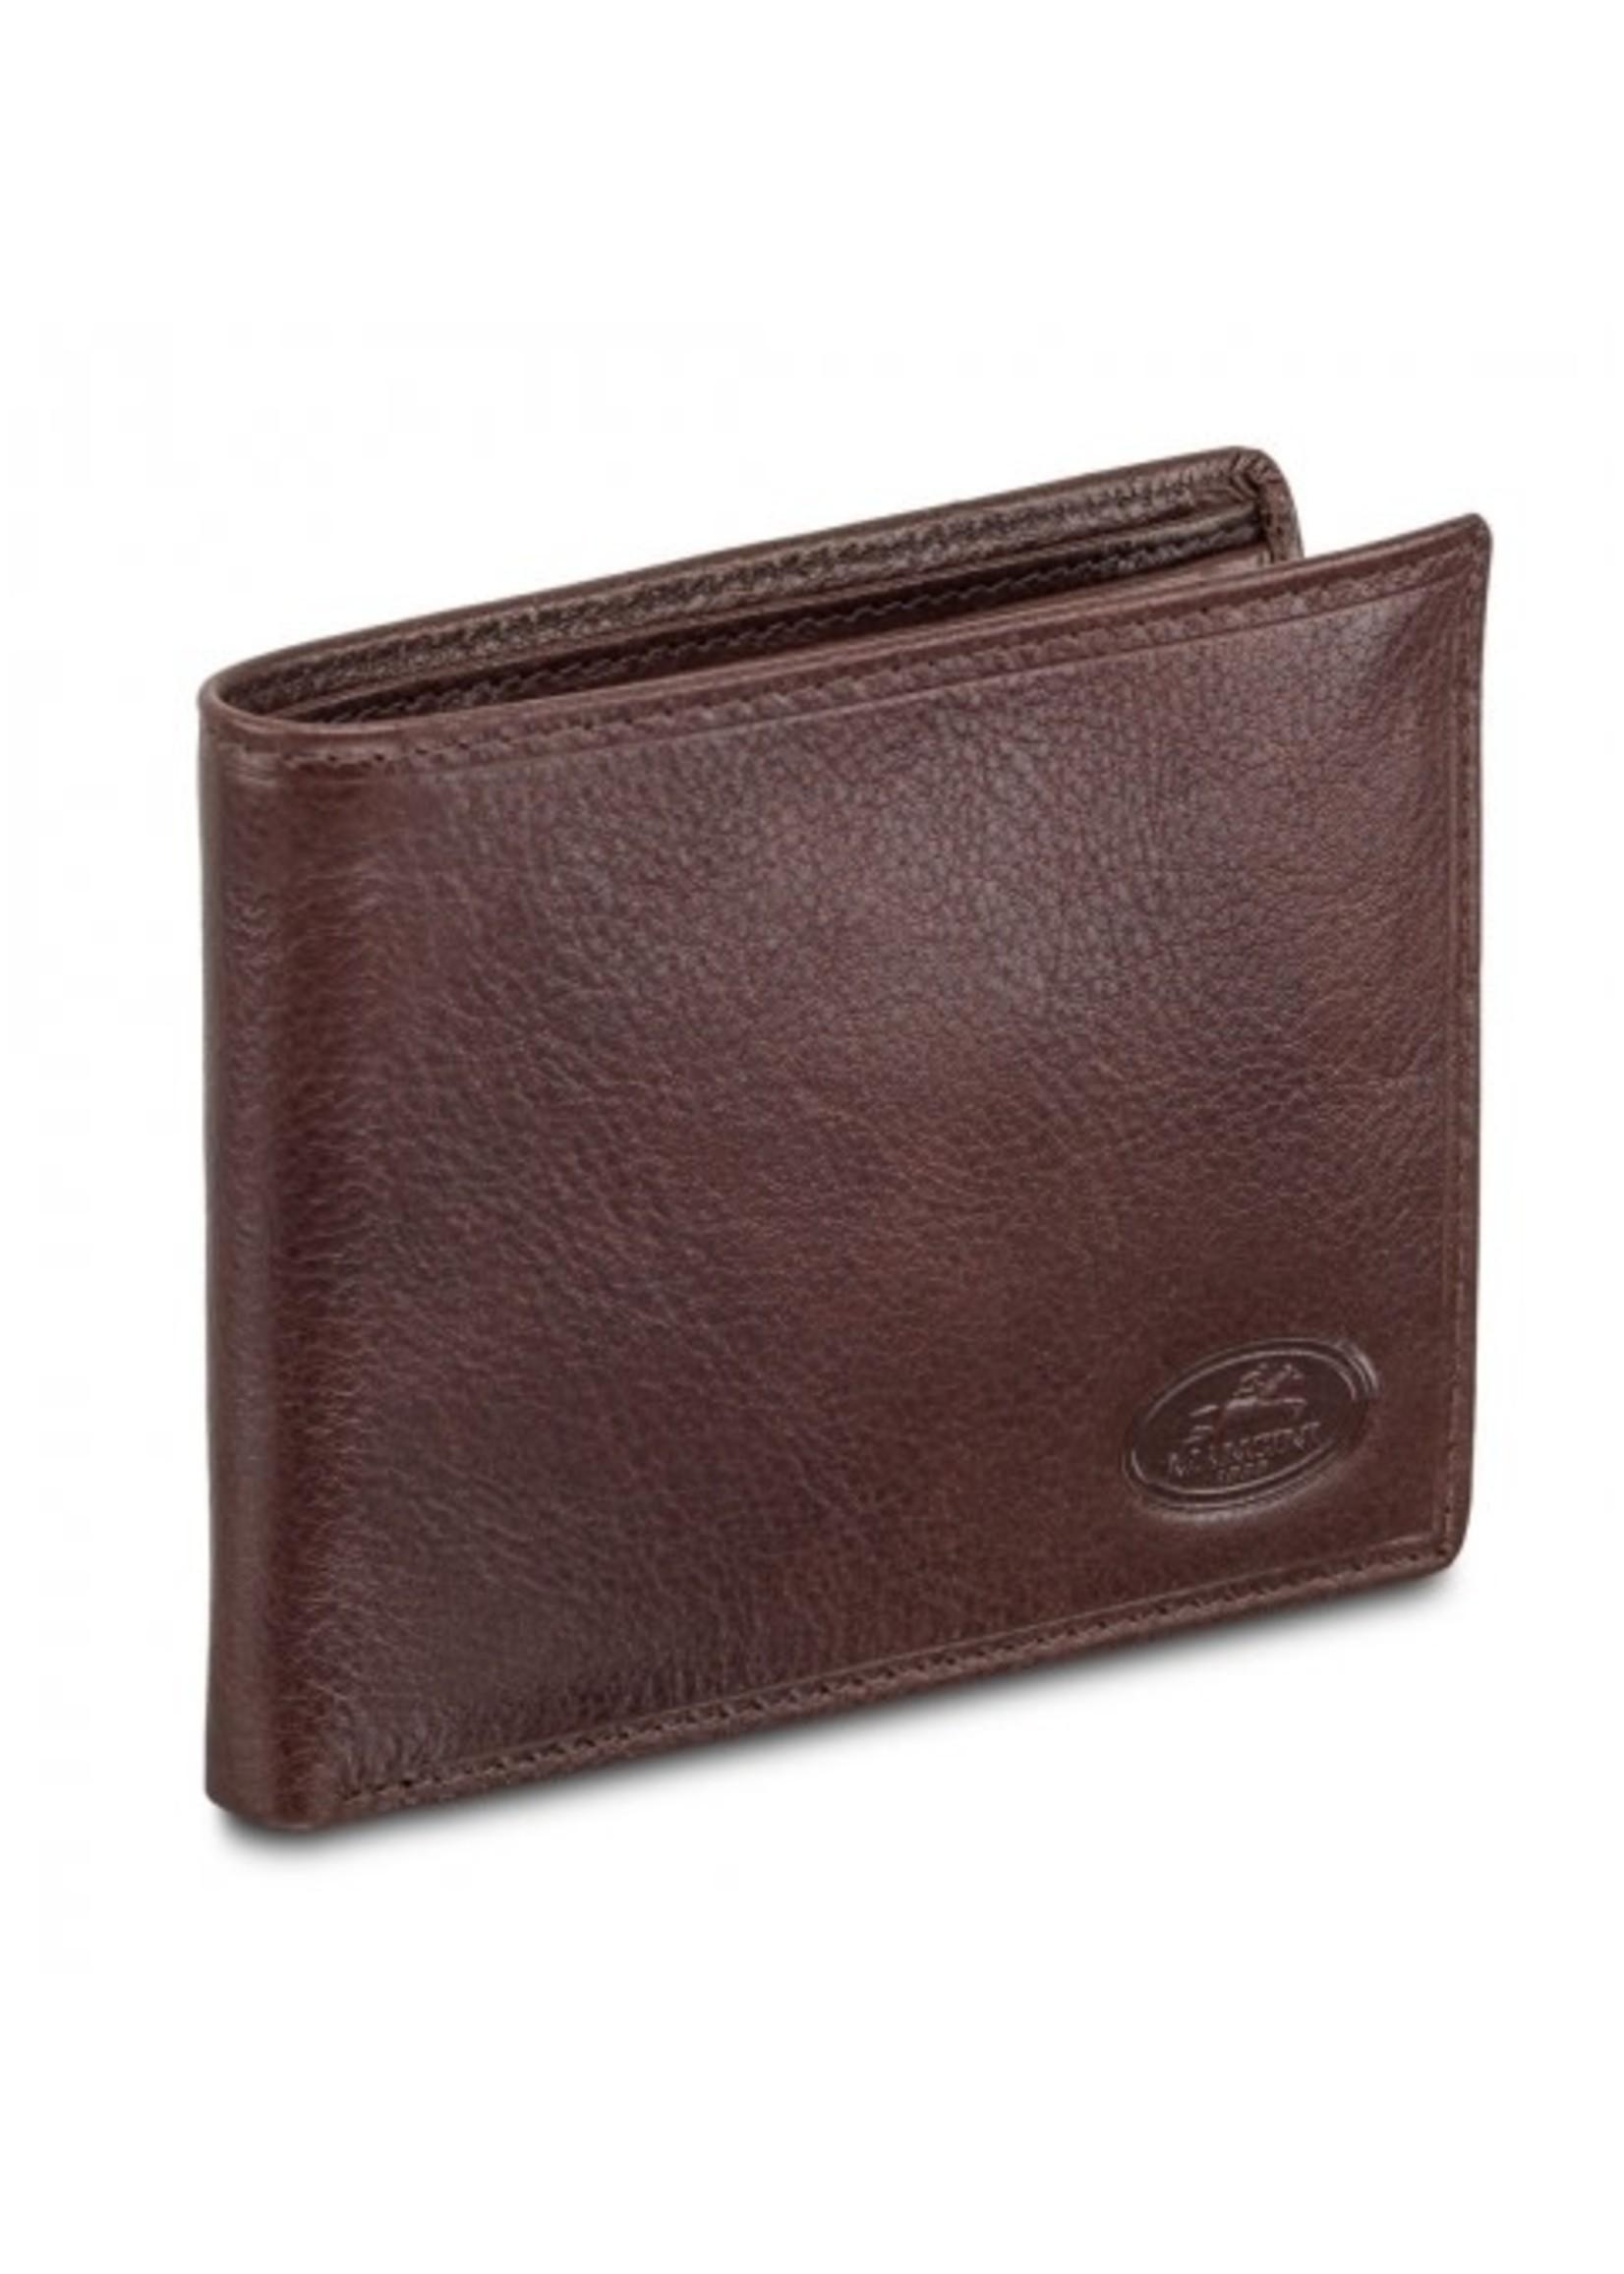 Mancini Men's RFID Secure Classic Billfold Wallet - Brown